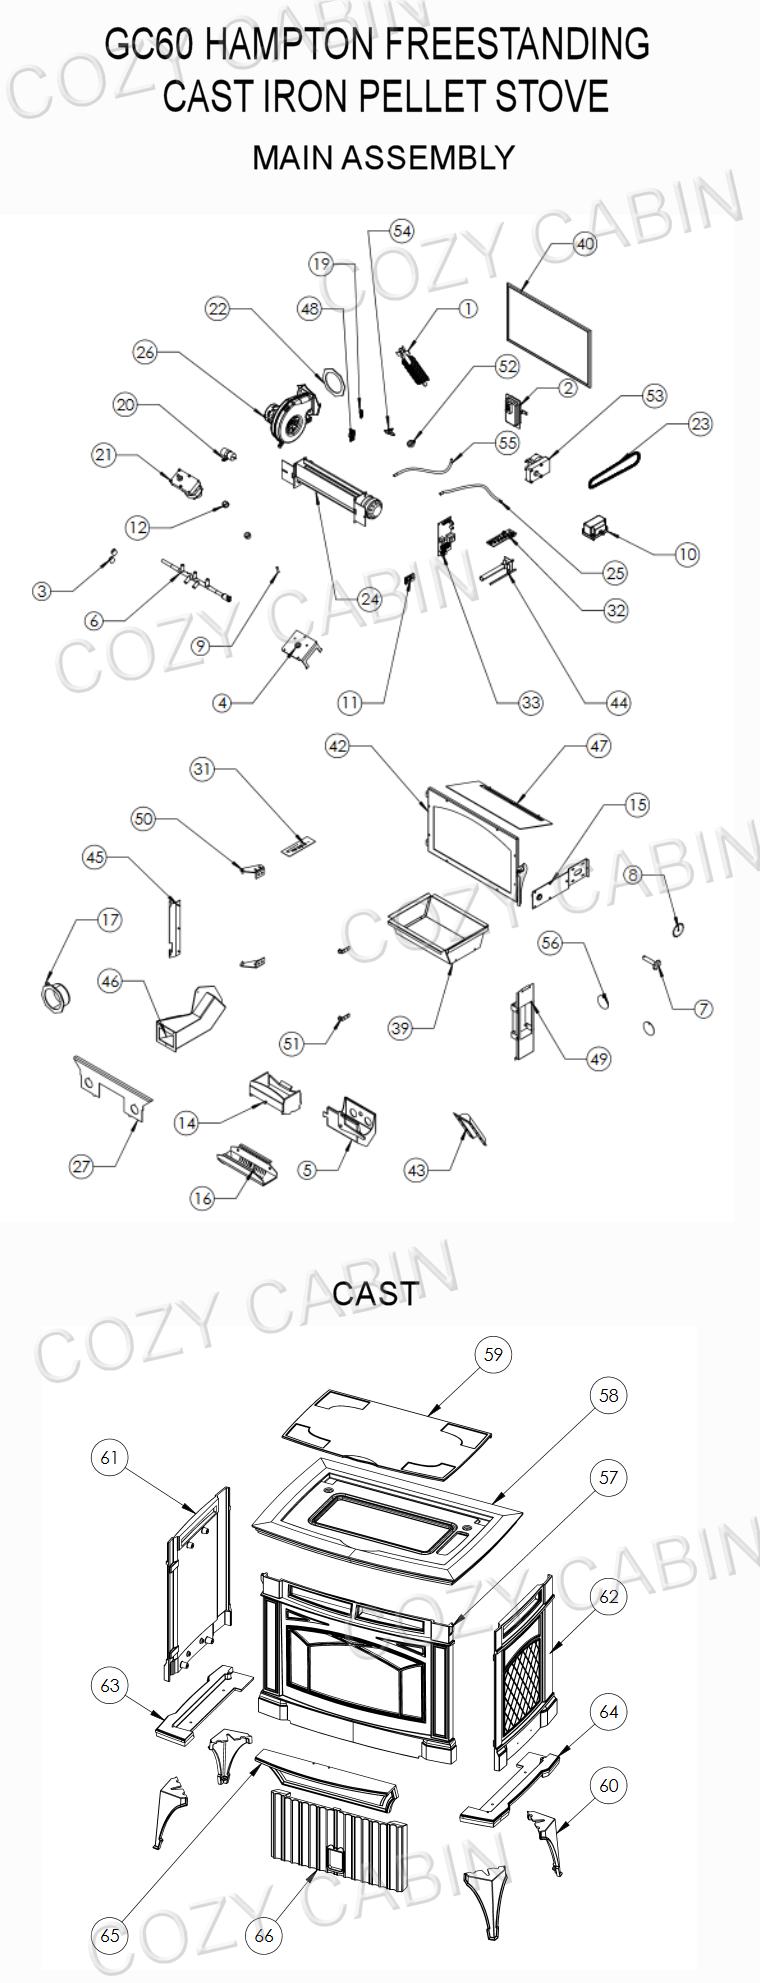 Hampton Pellet Stove Gc60 Cozy Cabin Regency Parts Store Hopper Wiring Diagram